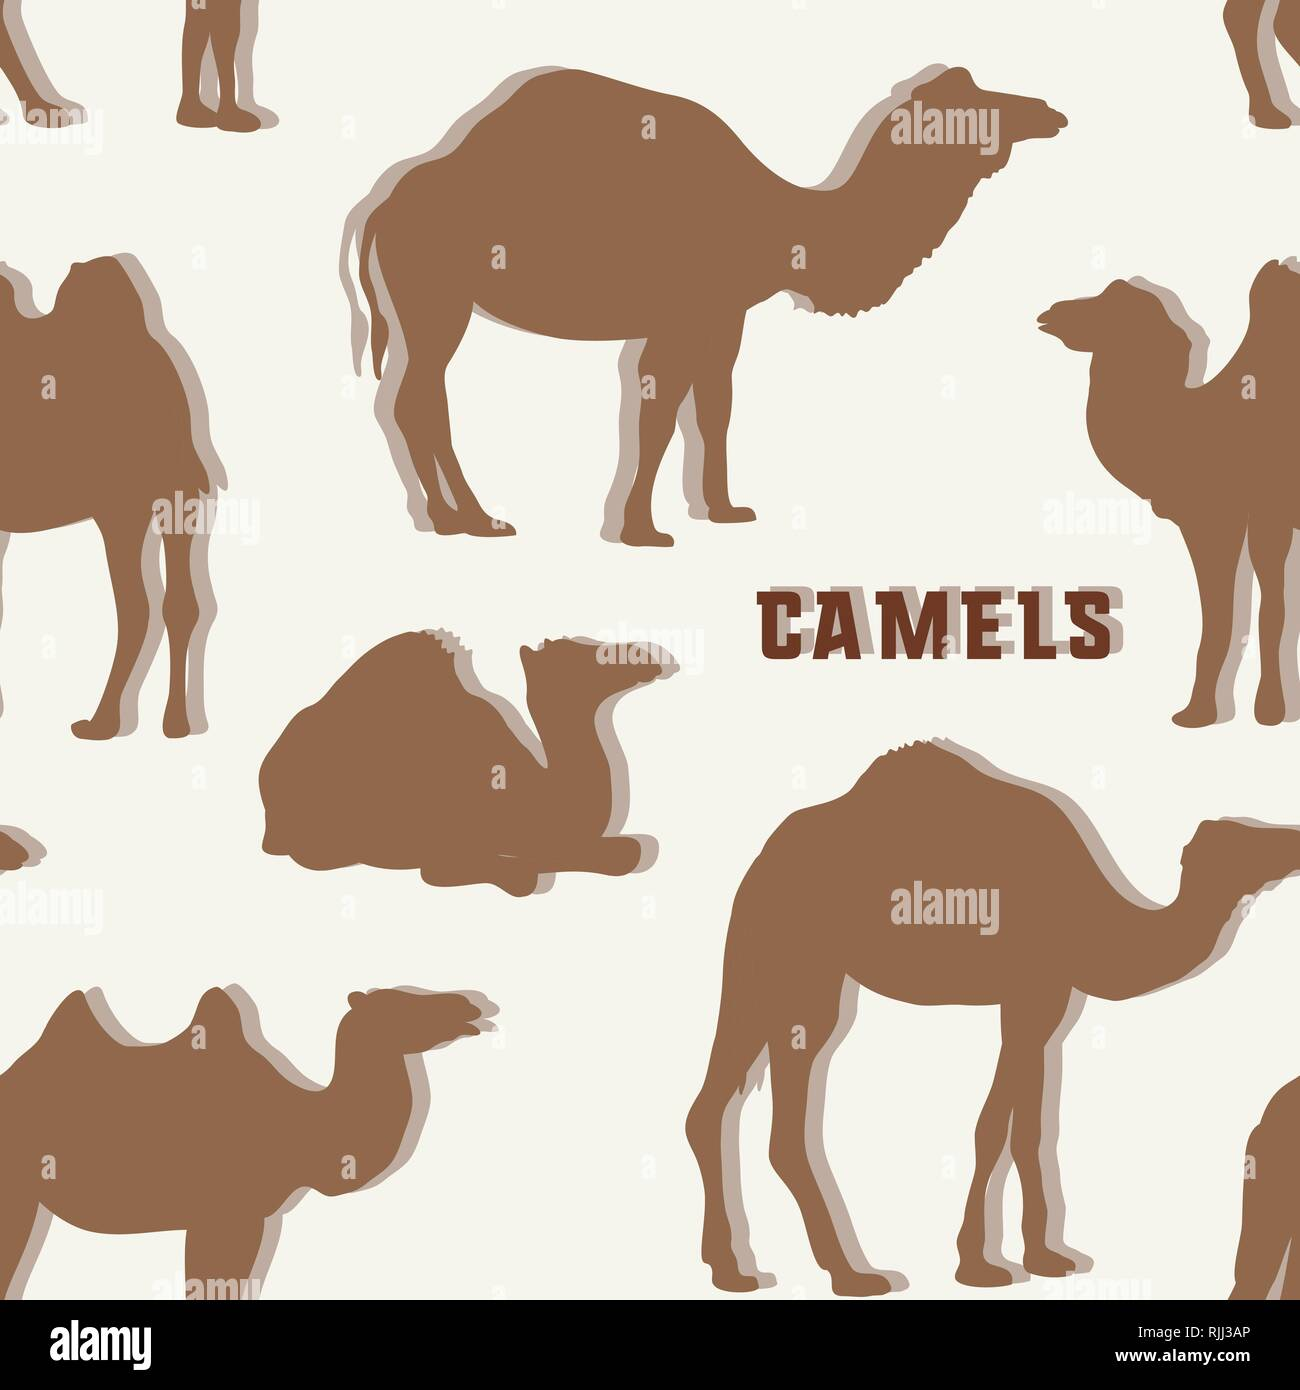 Camel Silhouettes set pattern. Vector illustration EPS 10 - Stock Image